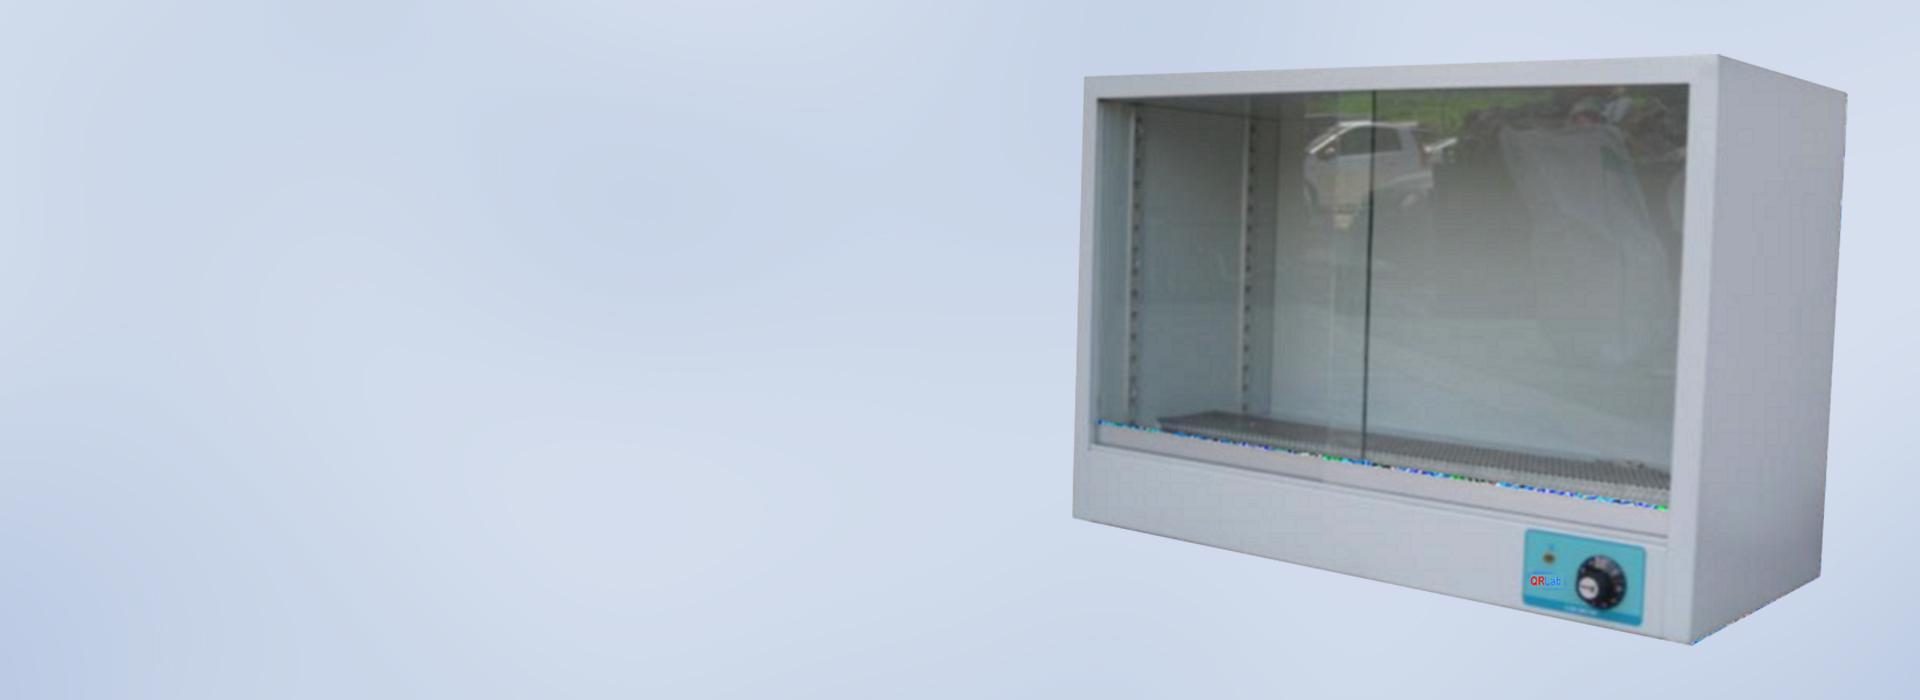 Laboratory Dryers Bench-Top Type